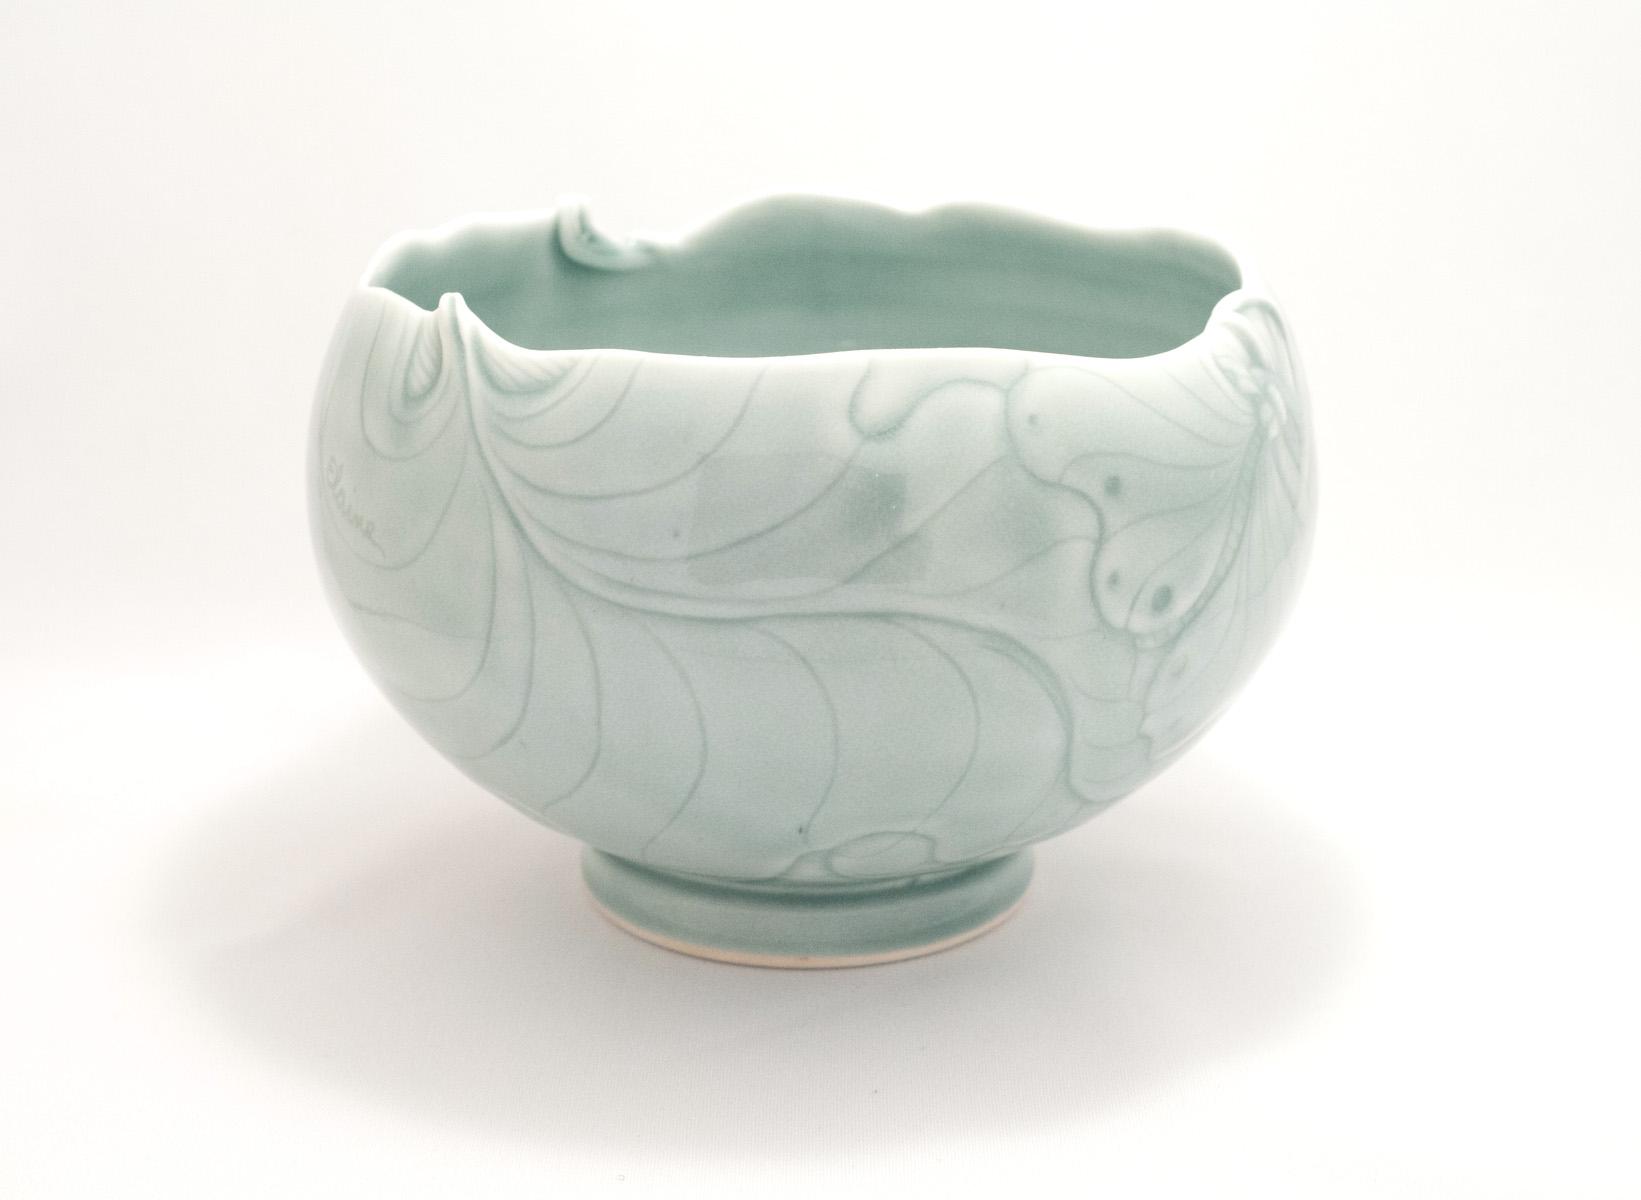 Elaine Coleman, Green Frog Jar, porcelain ceramic, celadon glaze, functional, pottery, Sherrie Gallerie